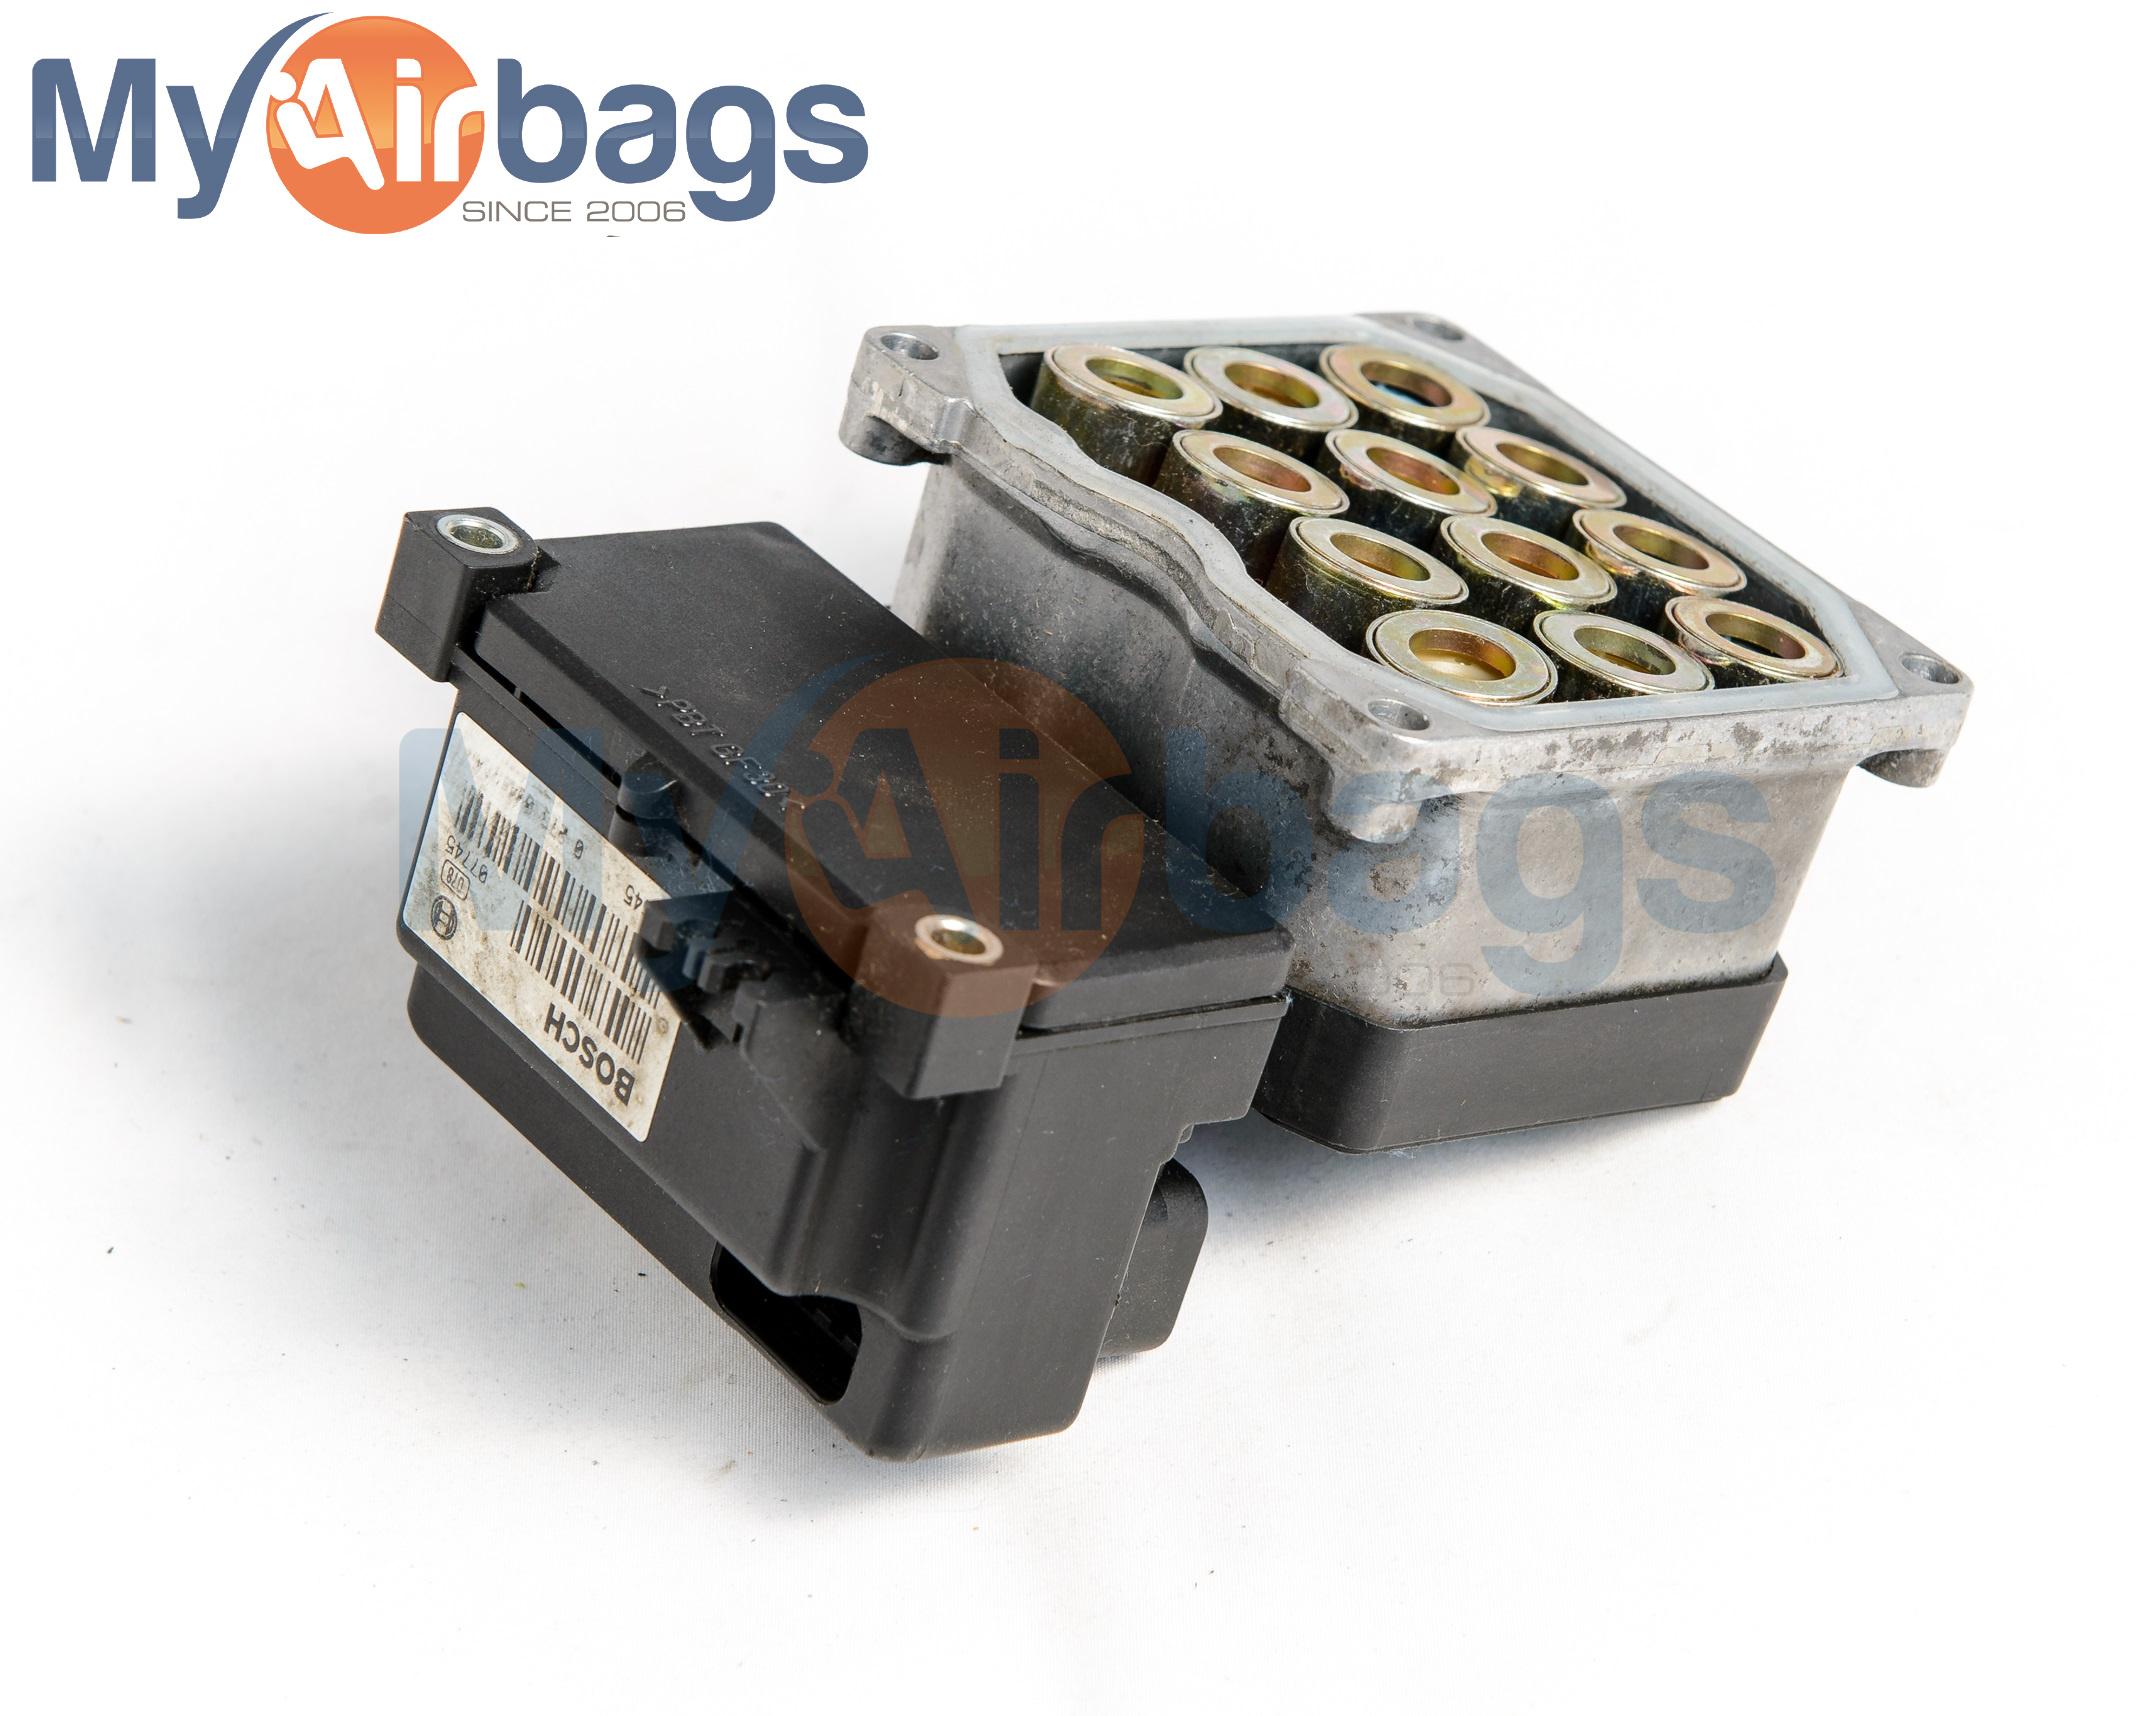 MyAirbags-ABS-Module-BOSCH-5.4-Img1